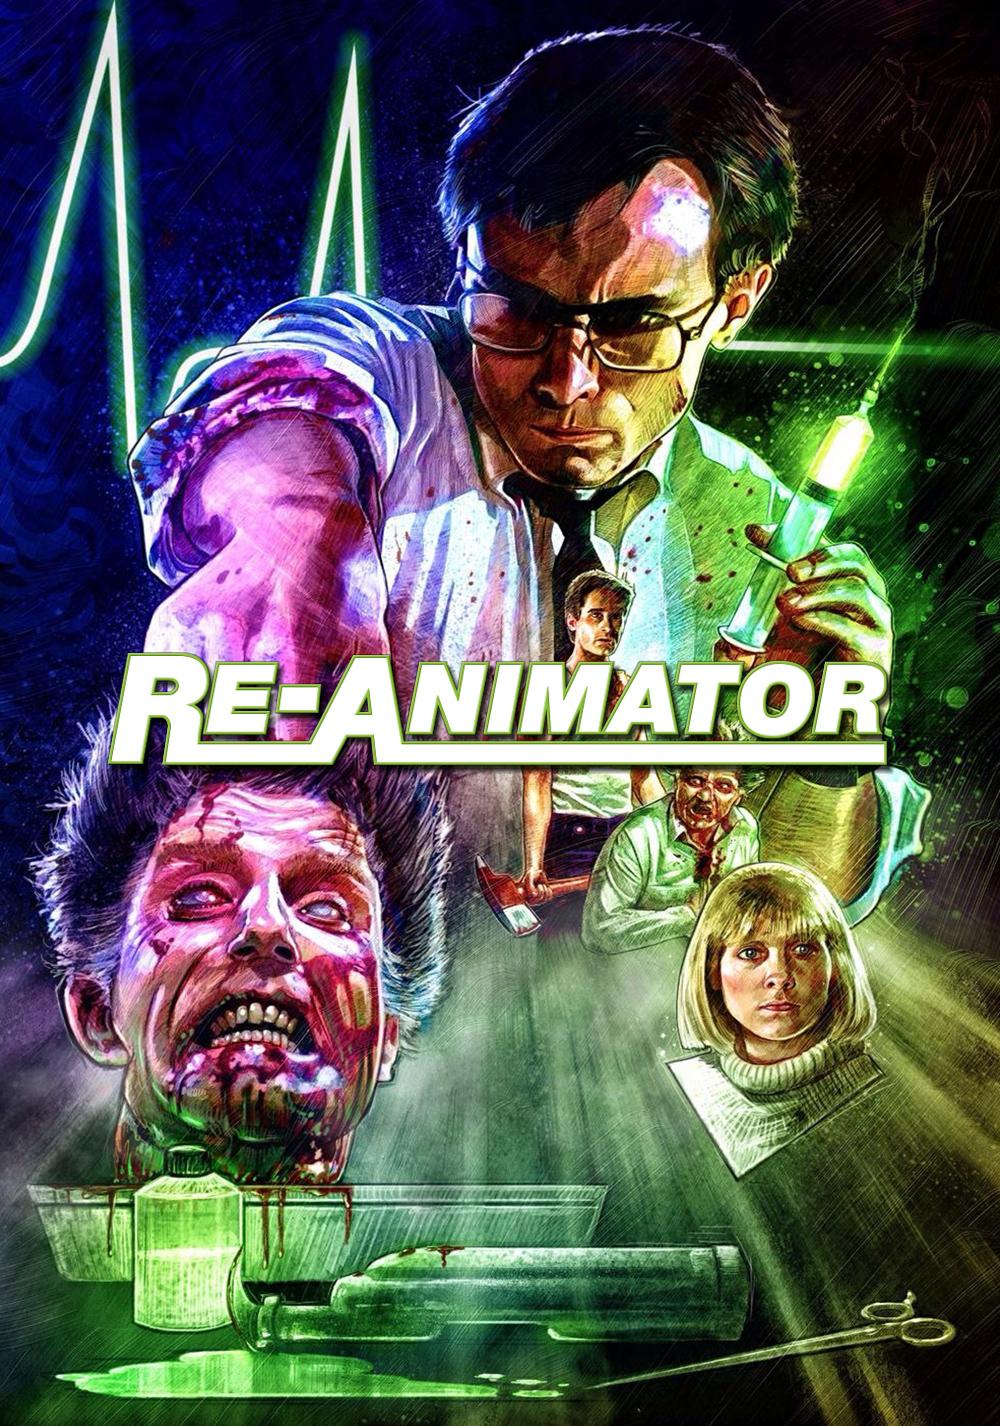 Barbara crampton in reanimator - 1 part 9